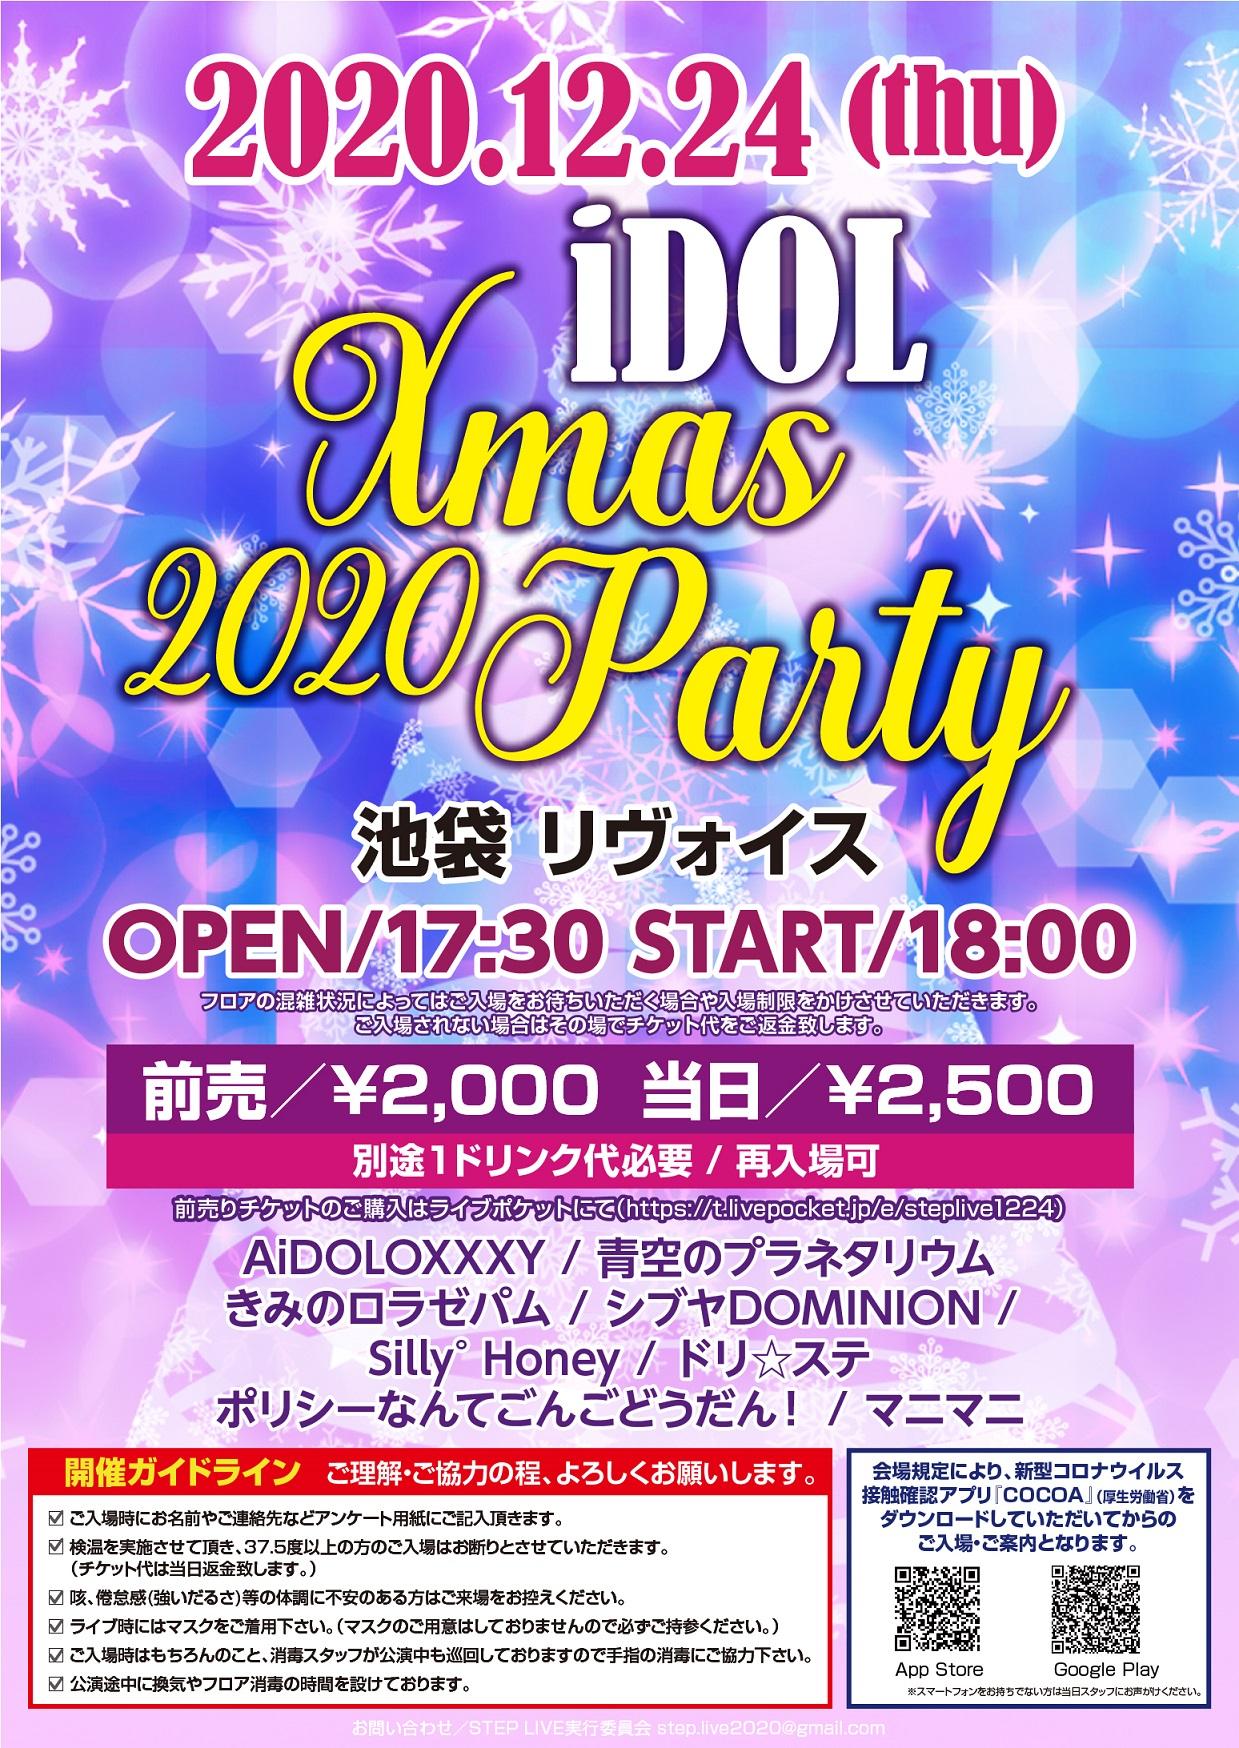 iDOL Xmas Party 2020